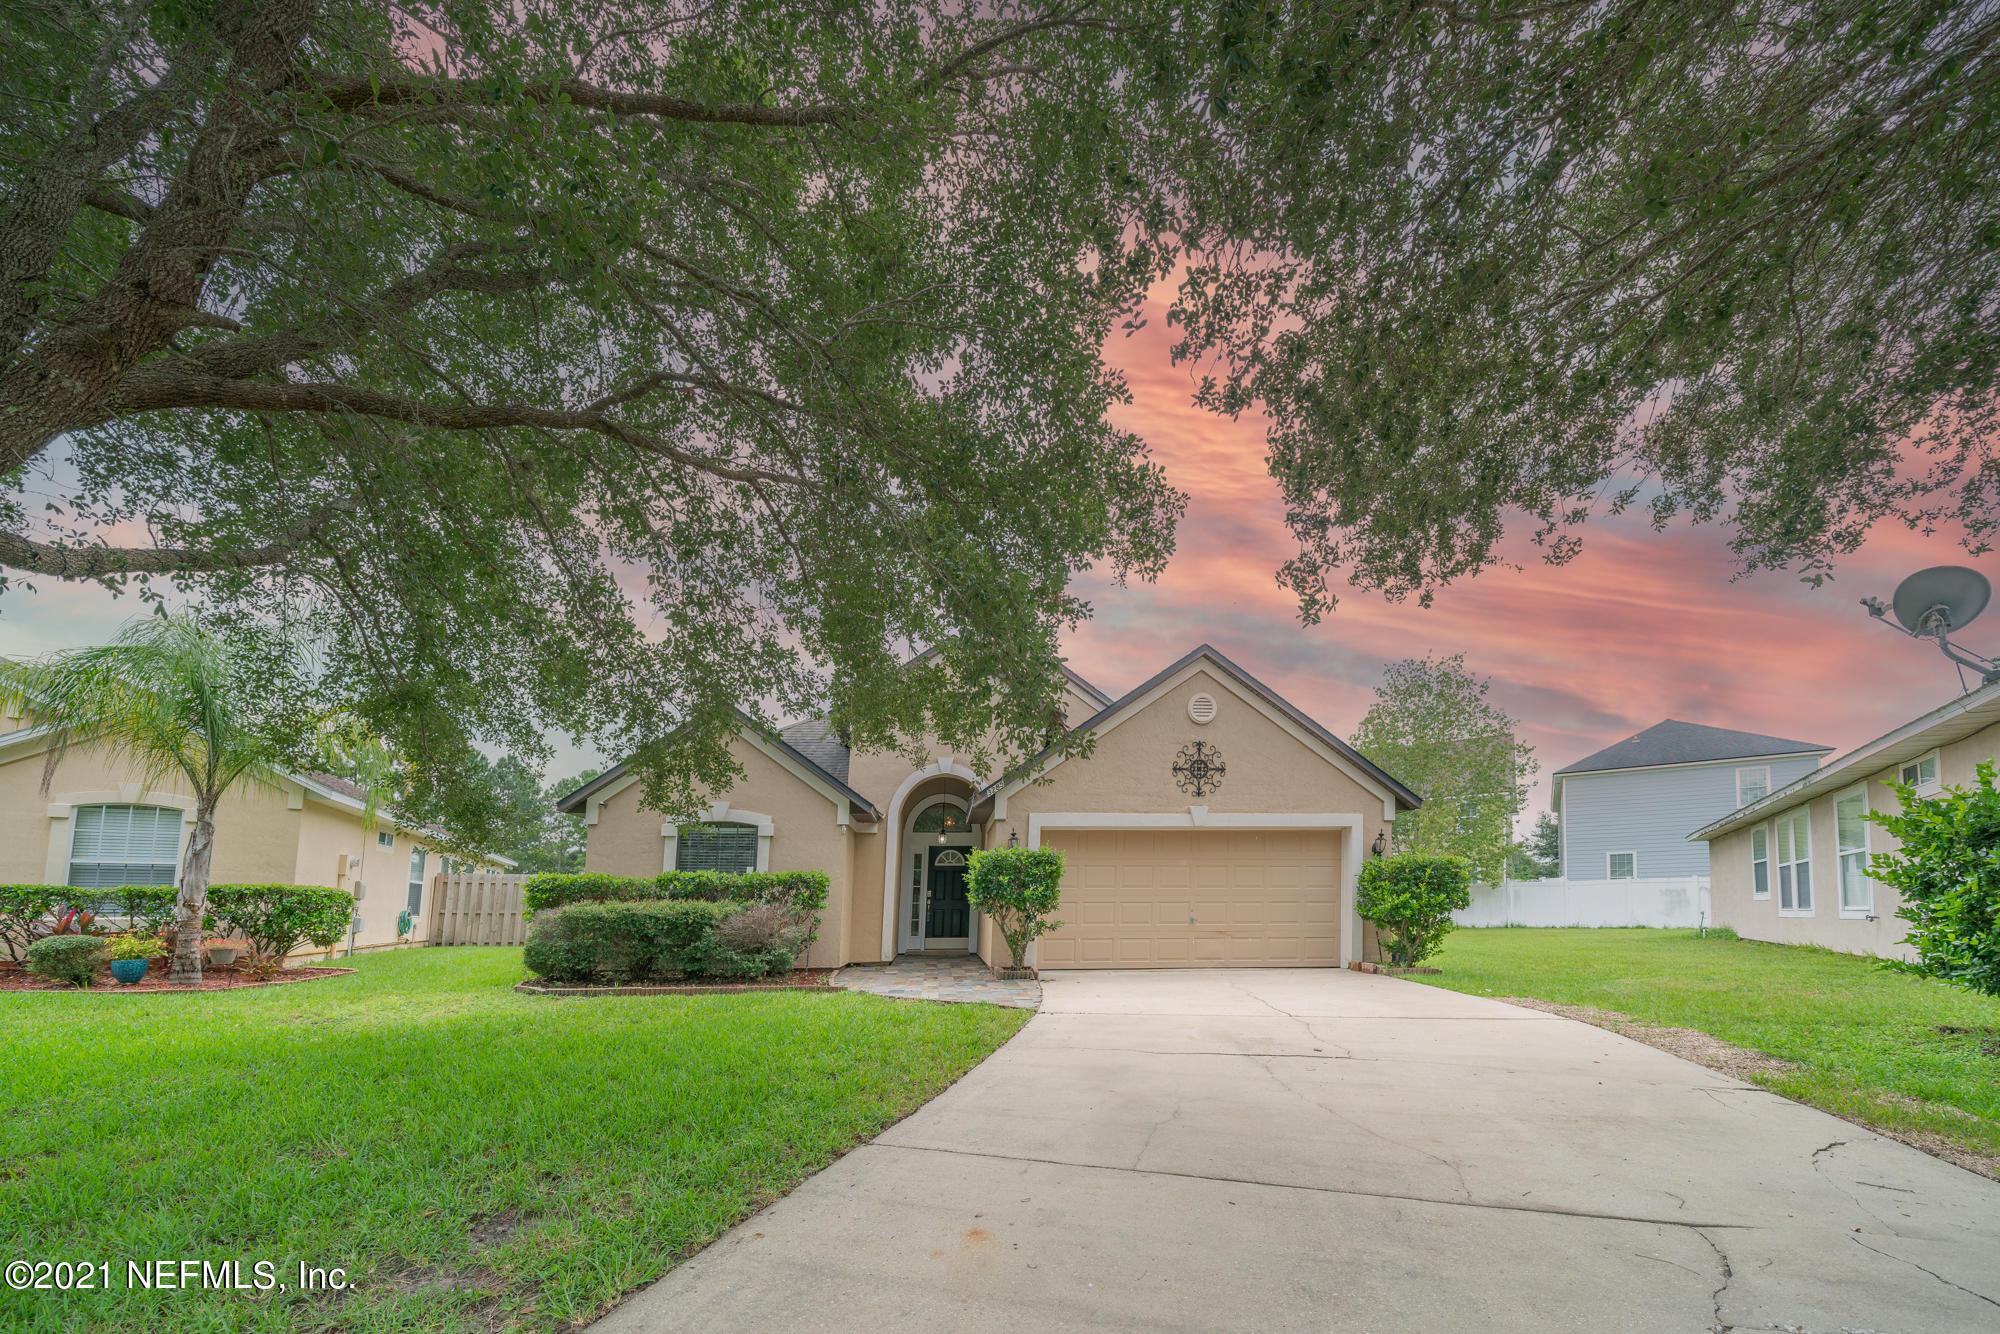 3285 HIGHLAND MILL, ORANGE PARK, FLORIDA 32065, 4 Bedrooms Bedrooms, ,3 BathroomsBathrooms,Residential,For sale,HIGHLAND MILL,1124415